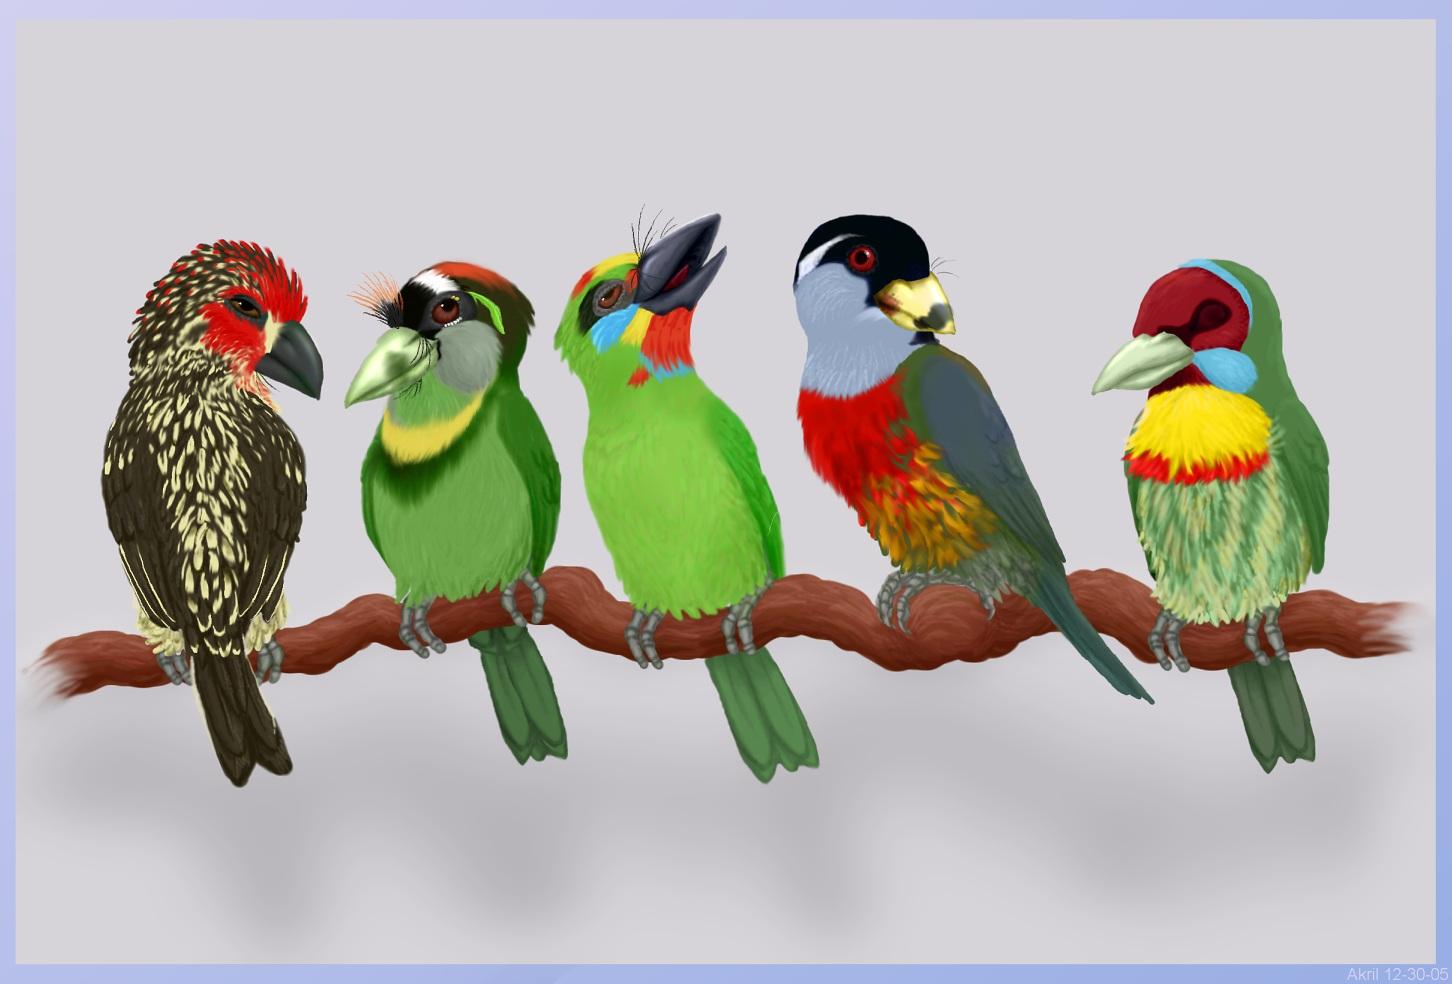 Five Barbets